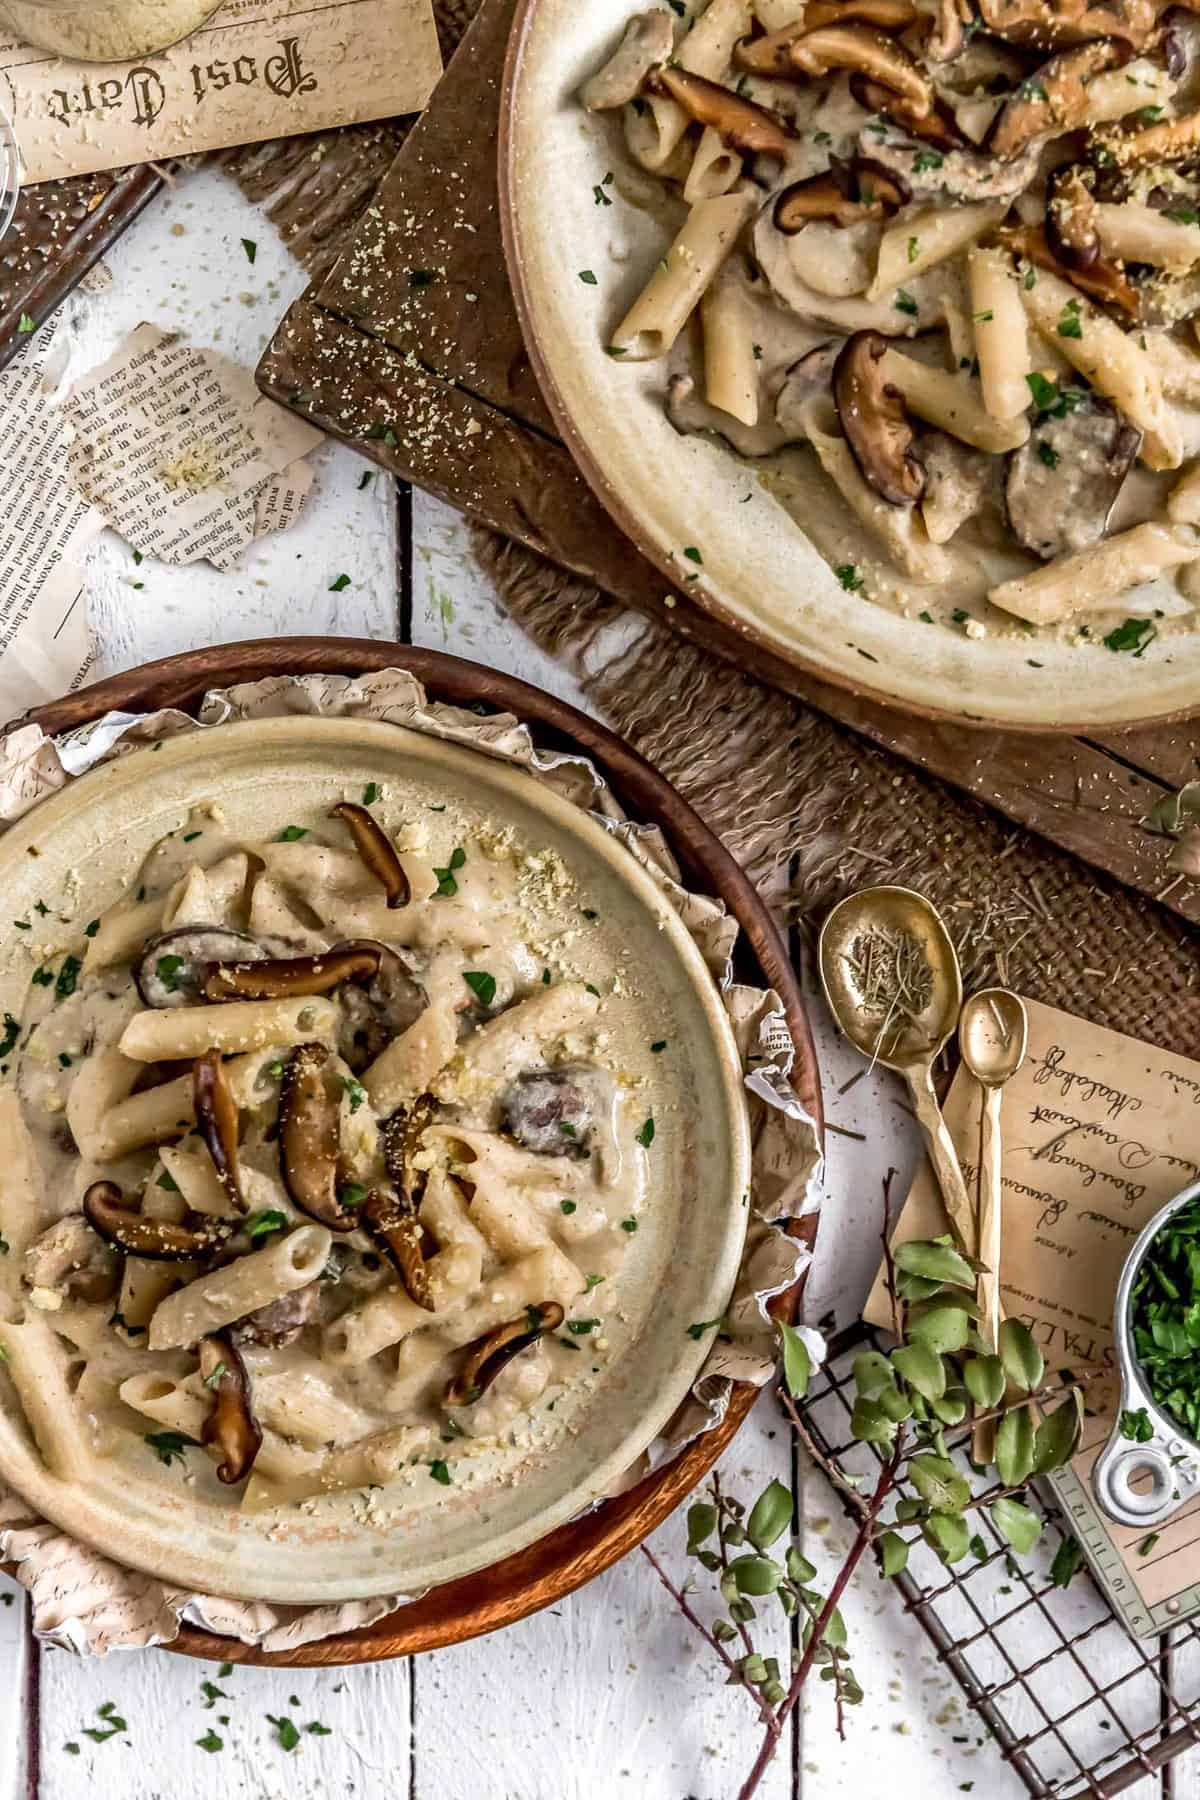 Plates of Creamy Herb Mushroom Pasta